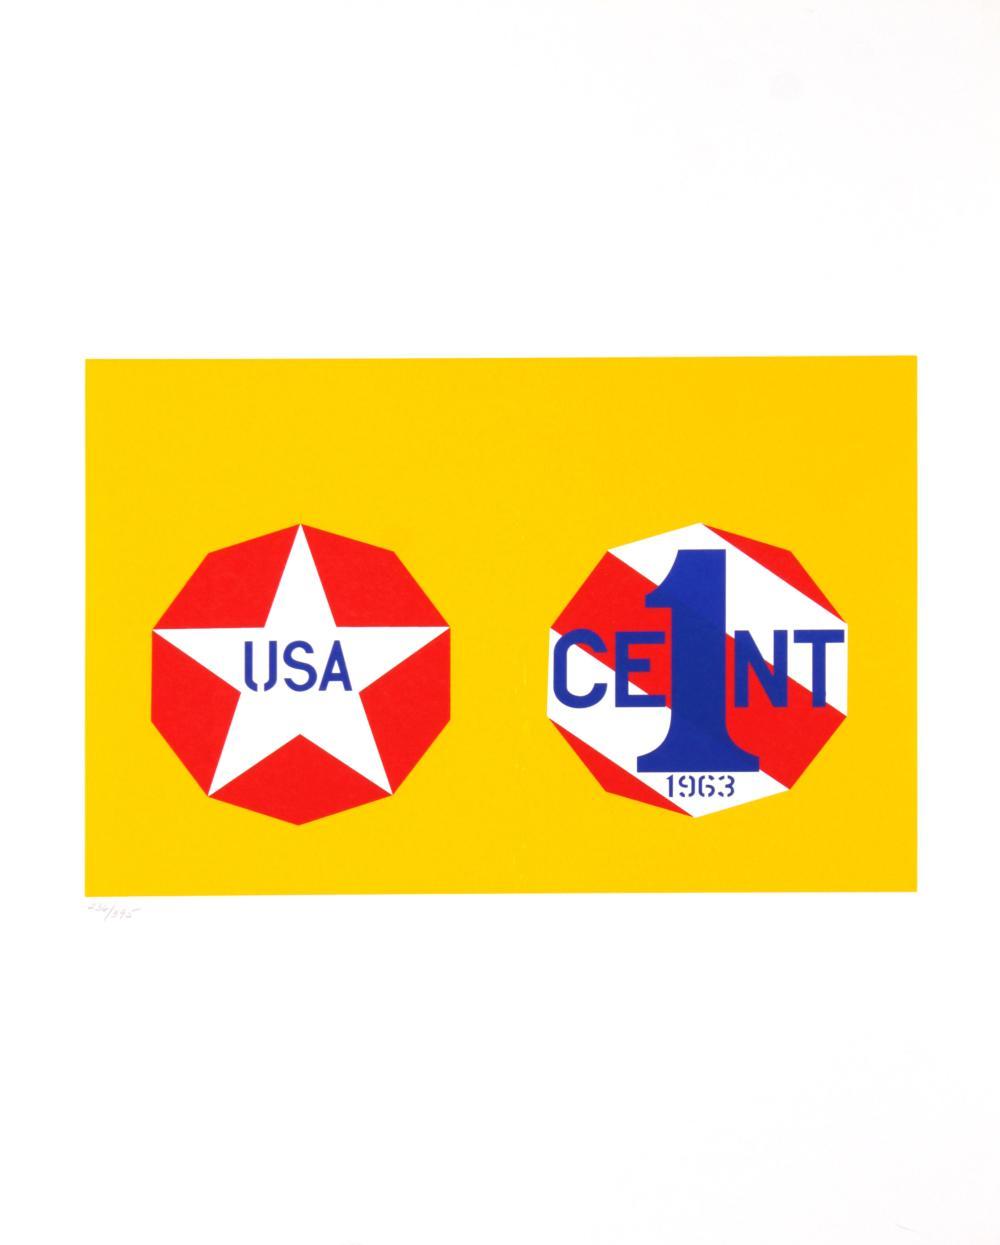 Robert Indiana - The American Dream 9